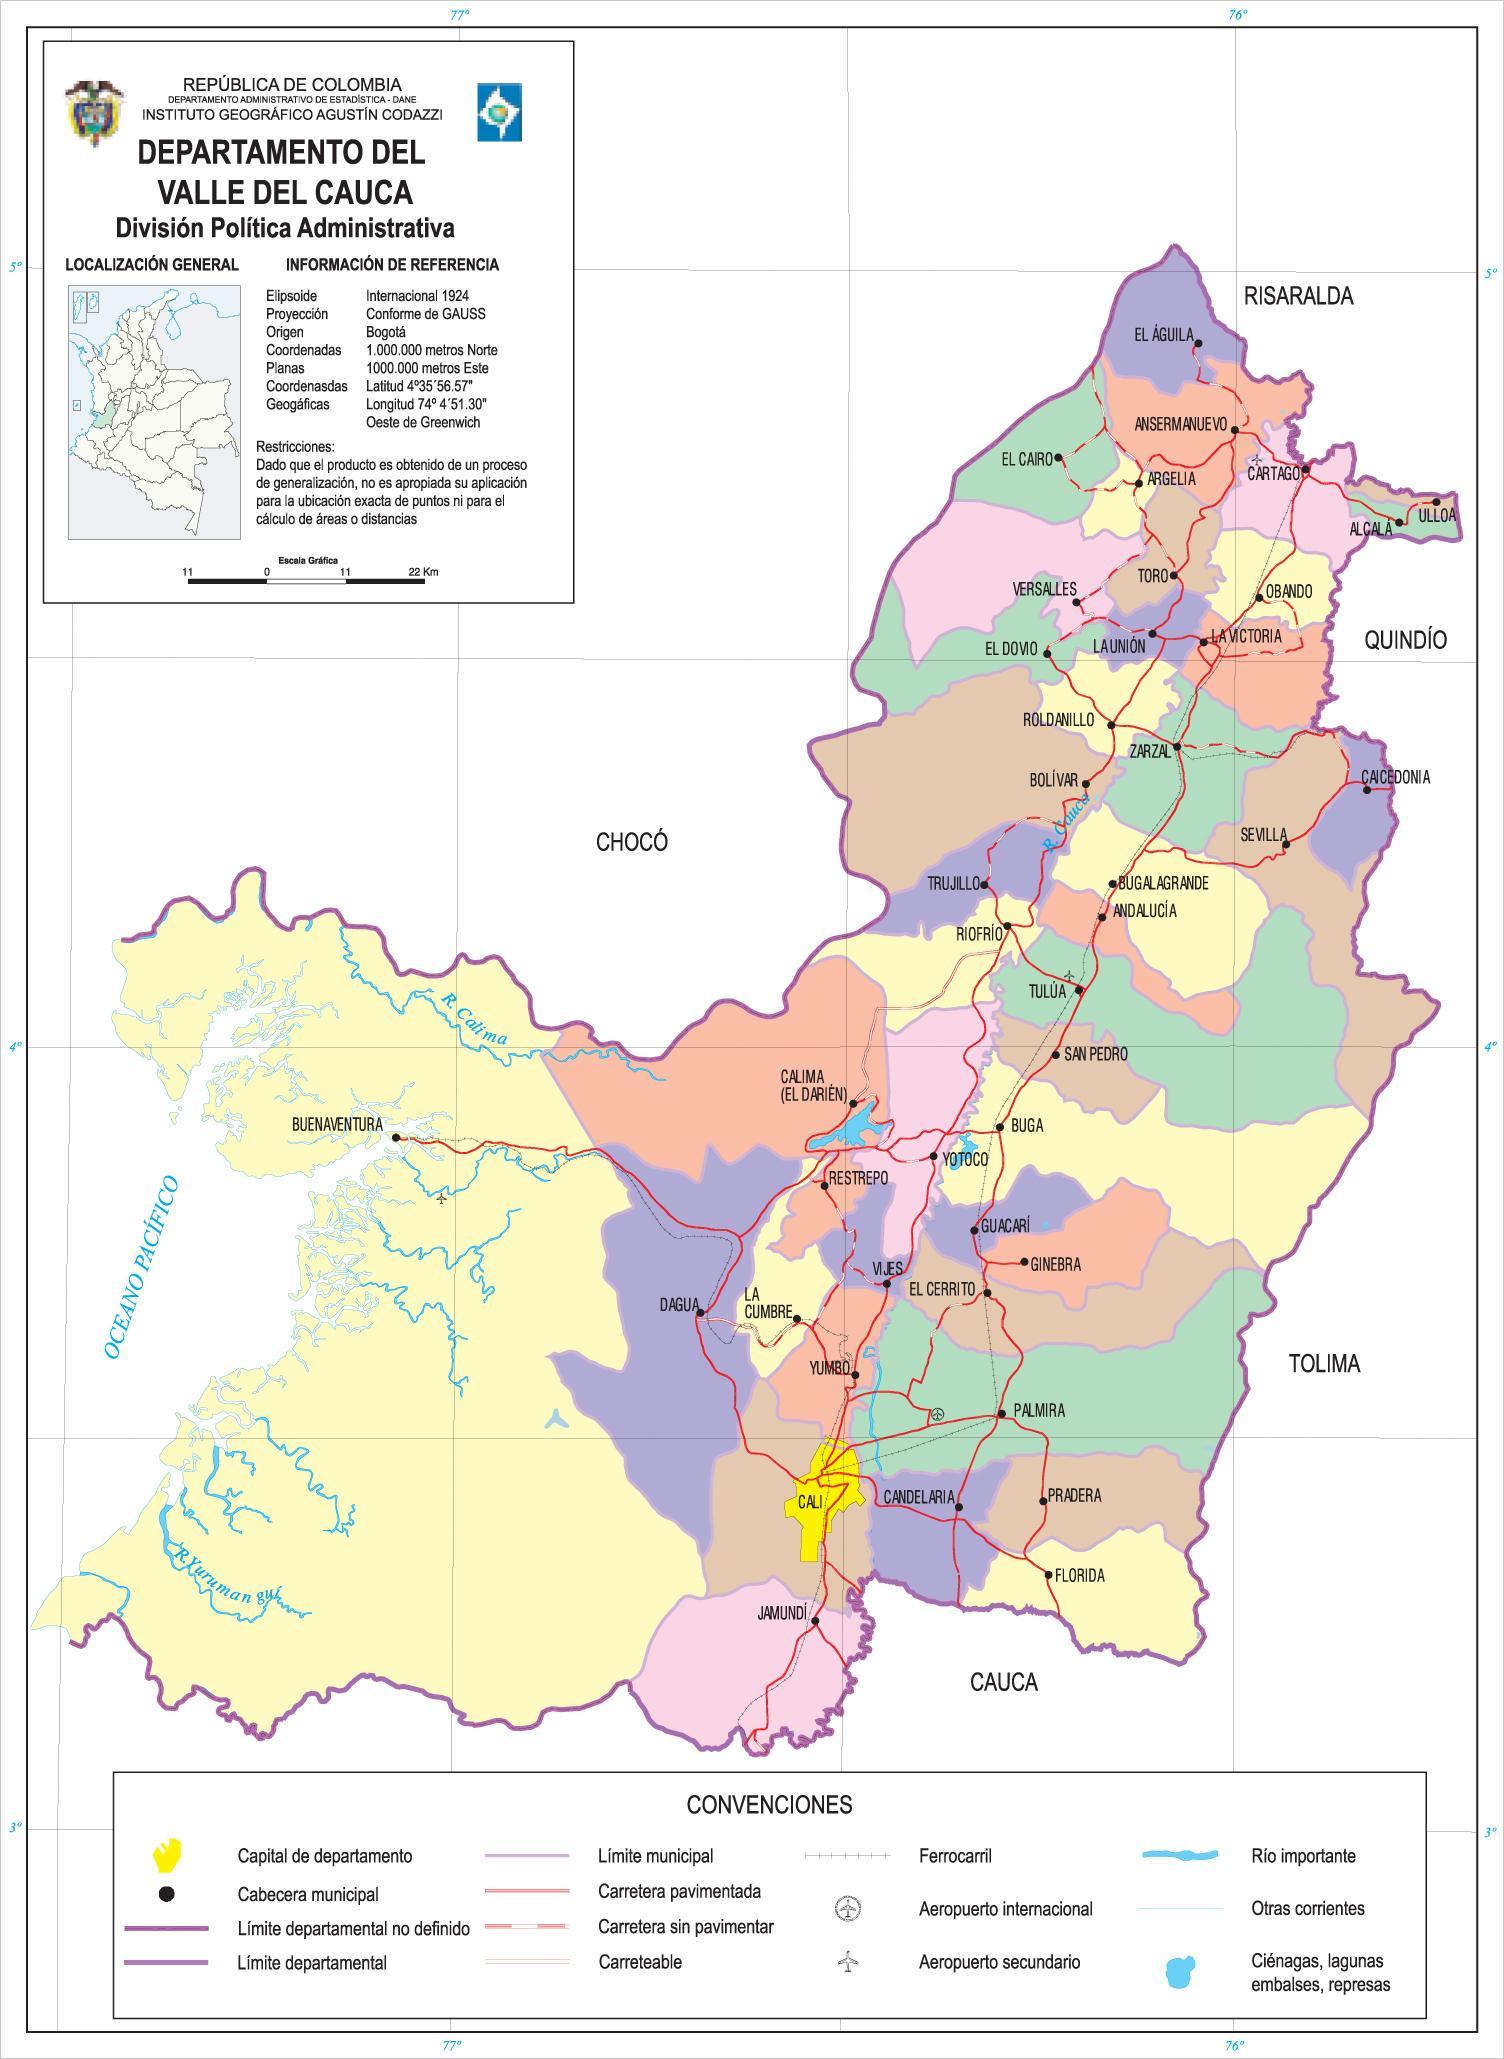 Valle del Cauca Department Map, Colombia